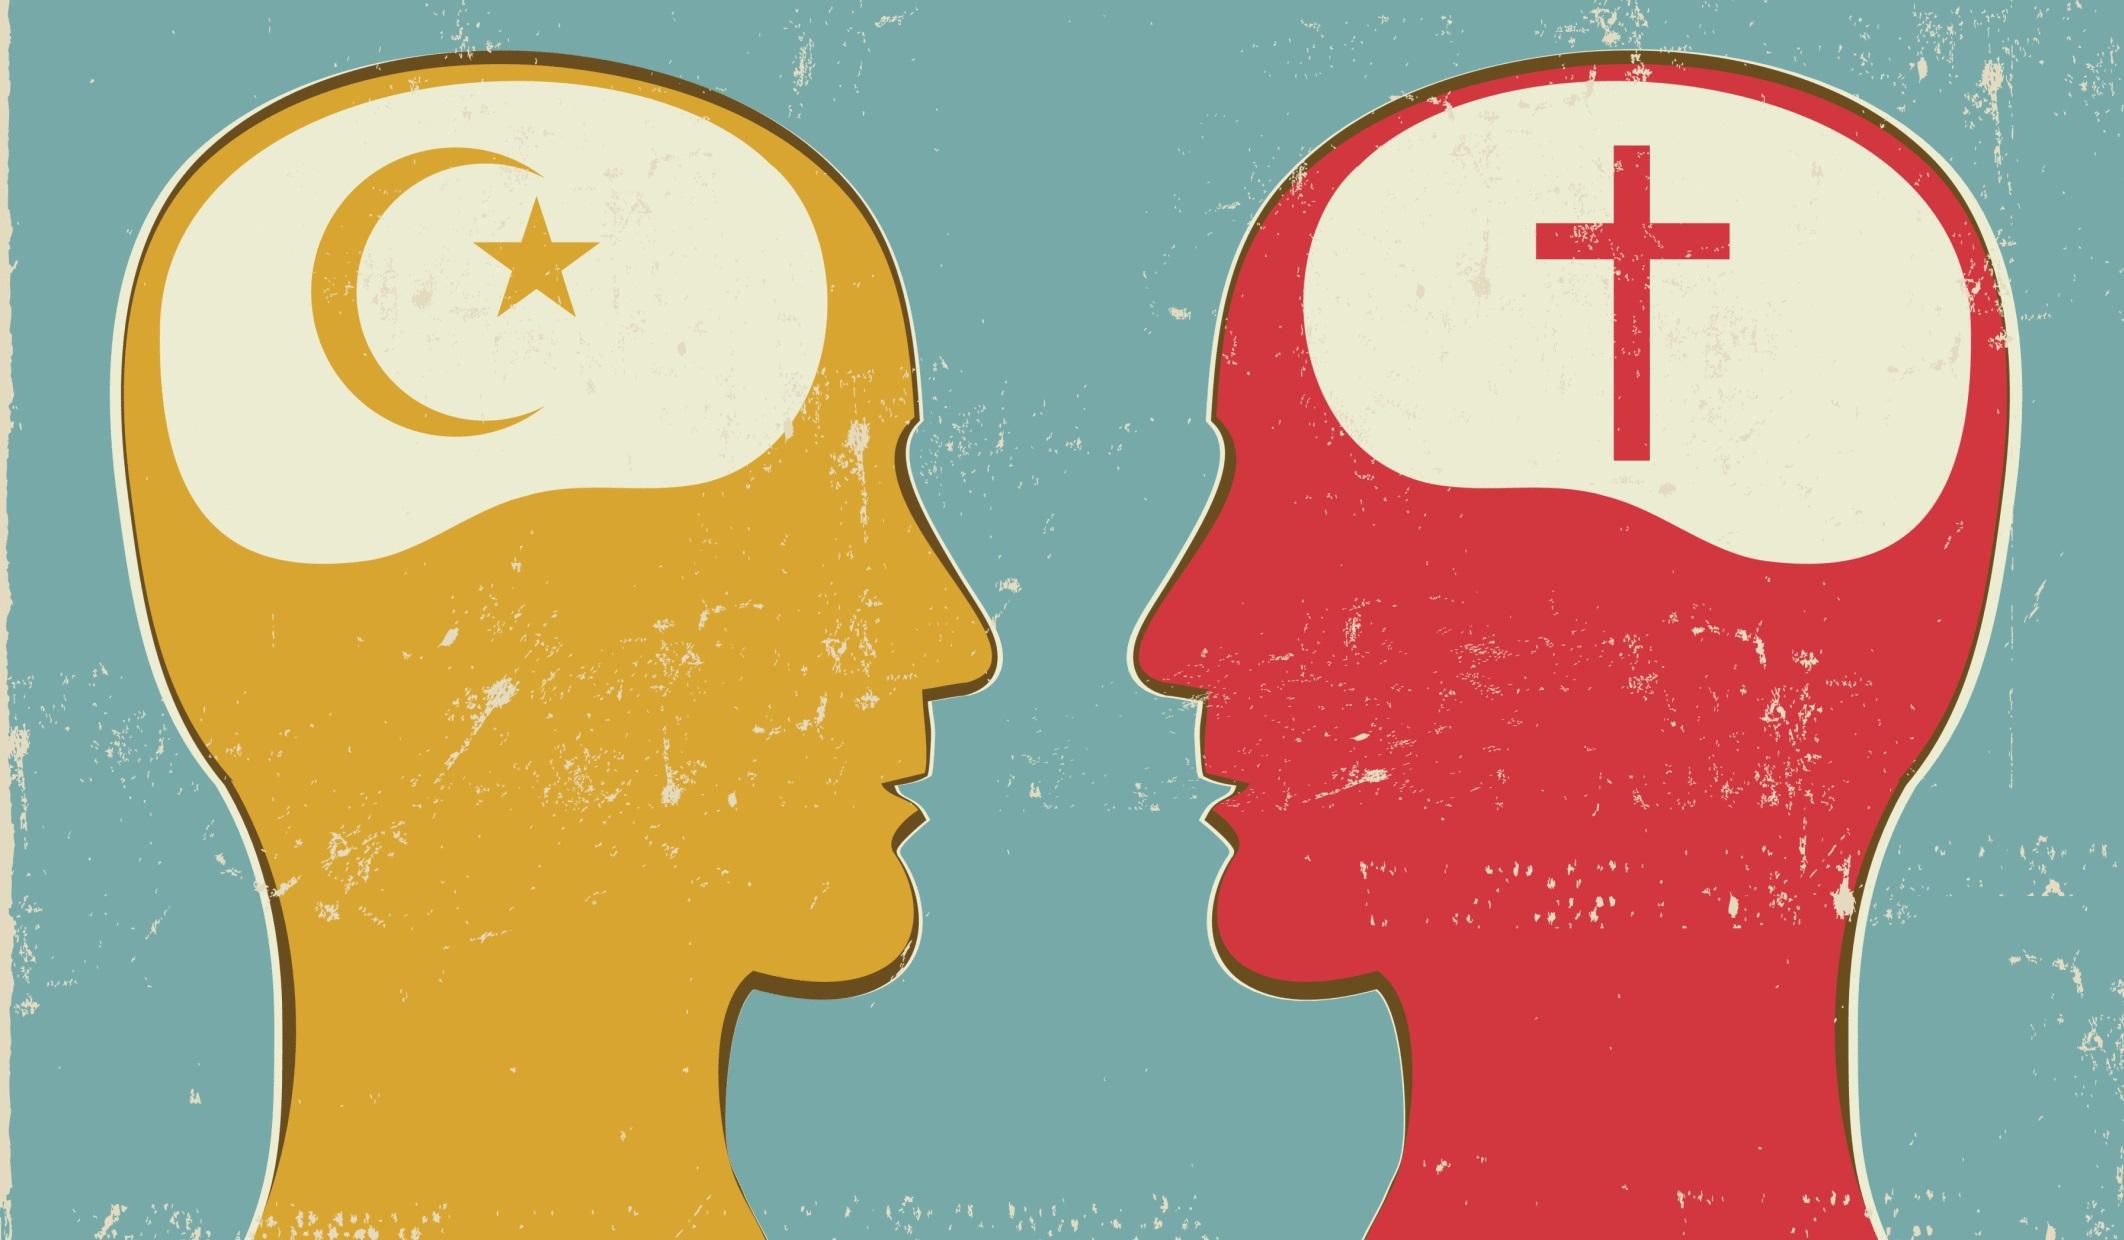 Christians are more violent